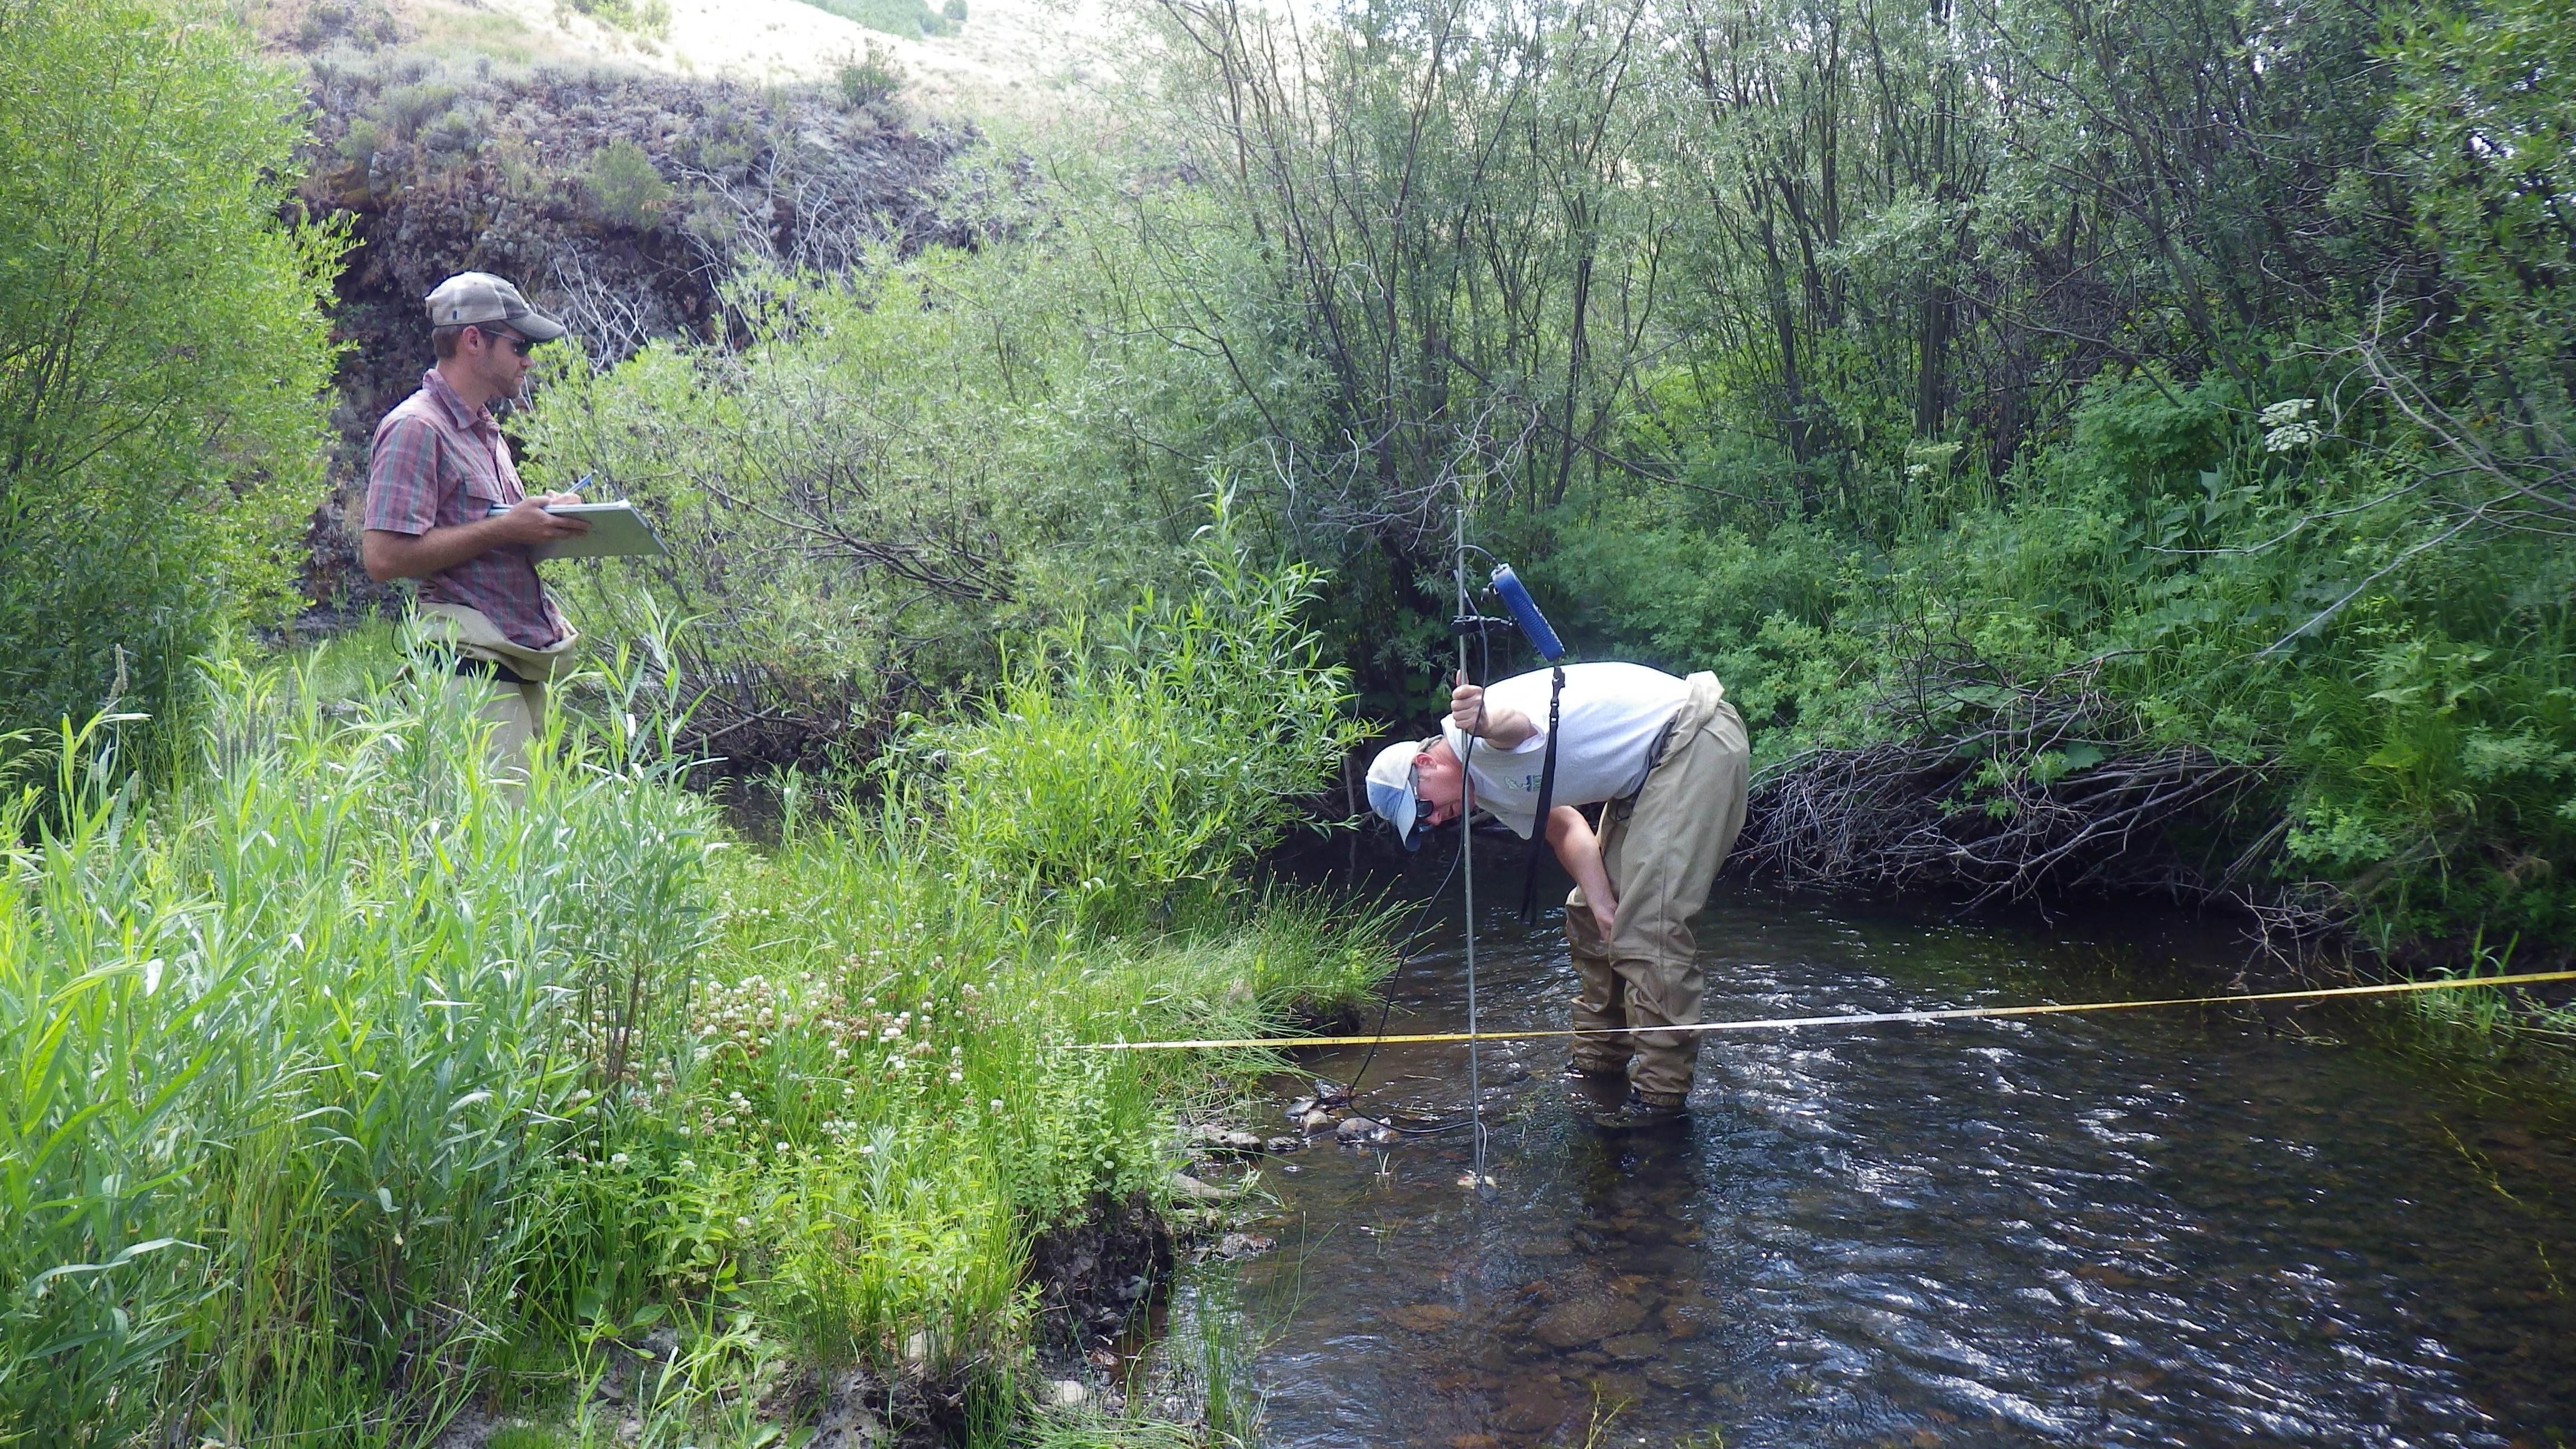 Measuring streamflows and other habitat characteristics in Goose Creek, Idaho.